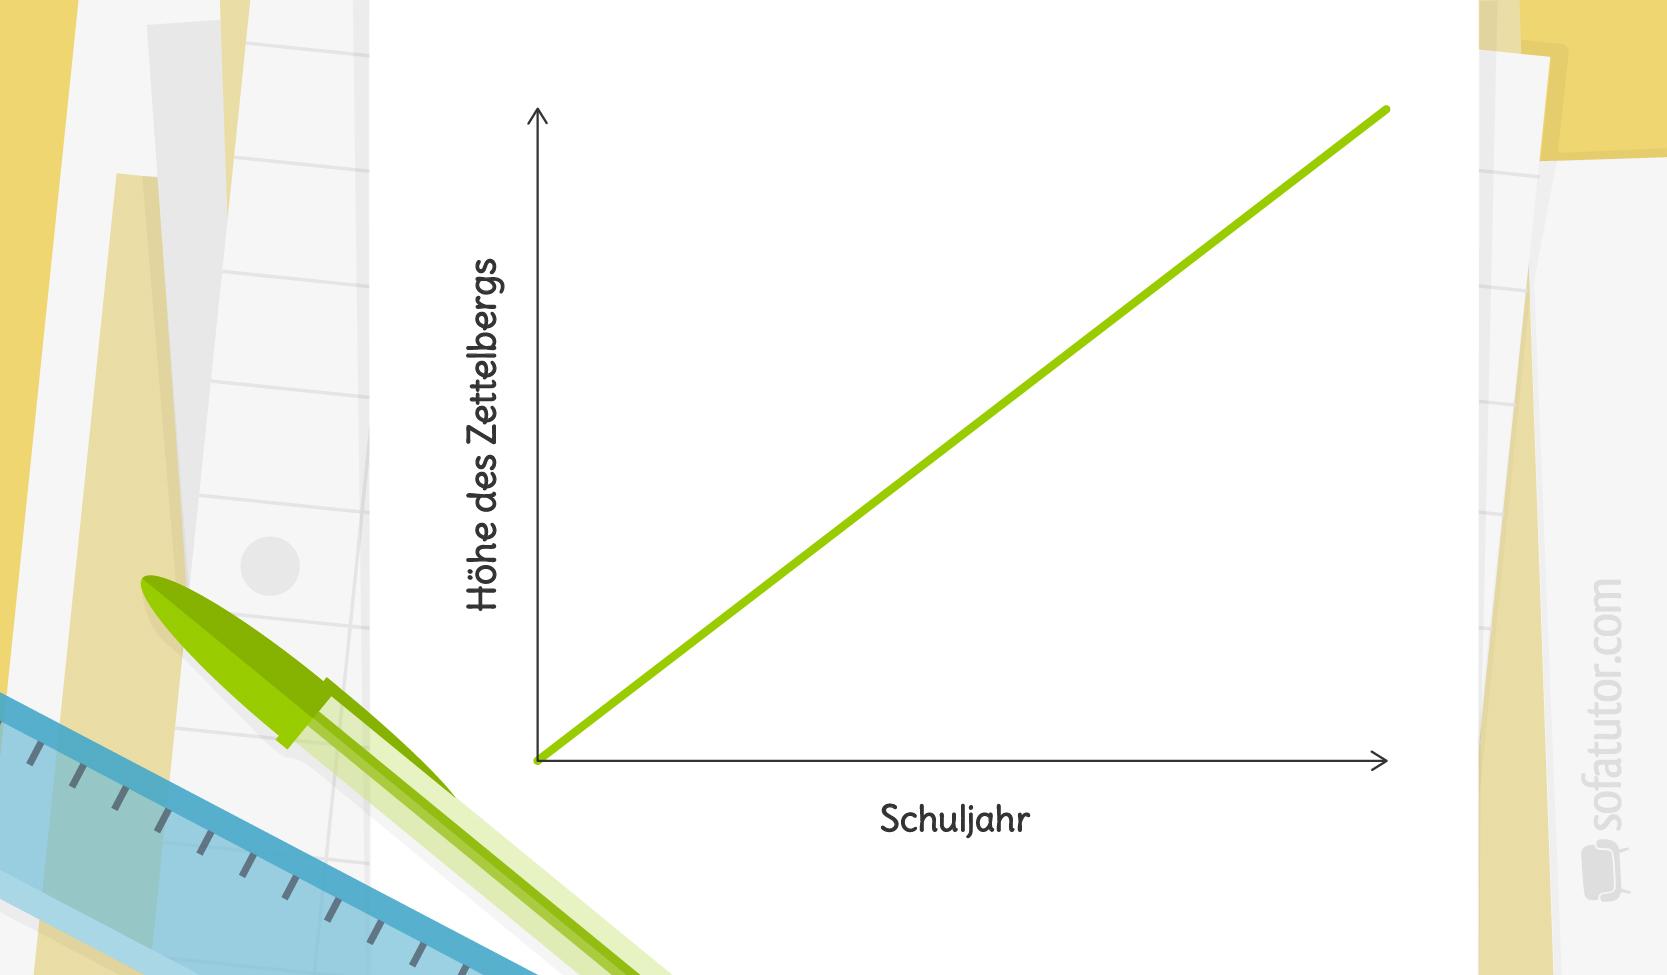 Mathe-Graphen-Alltag- Zettel